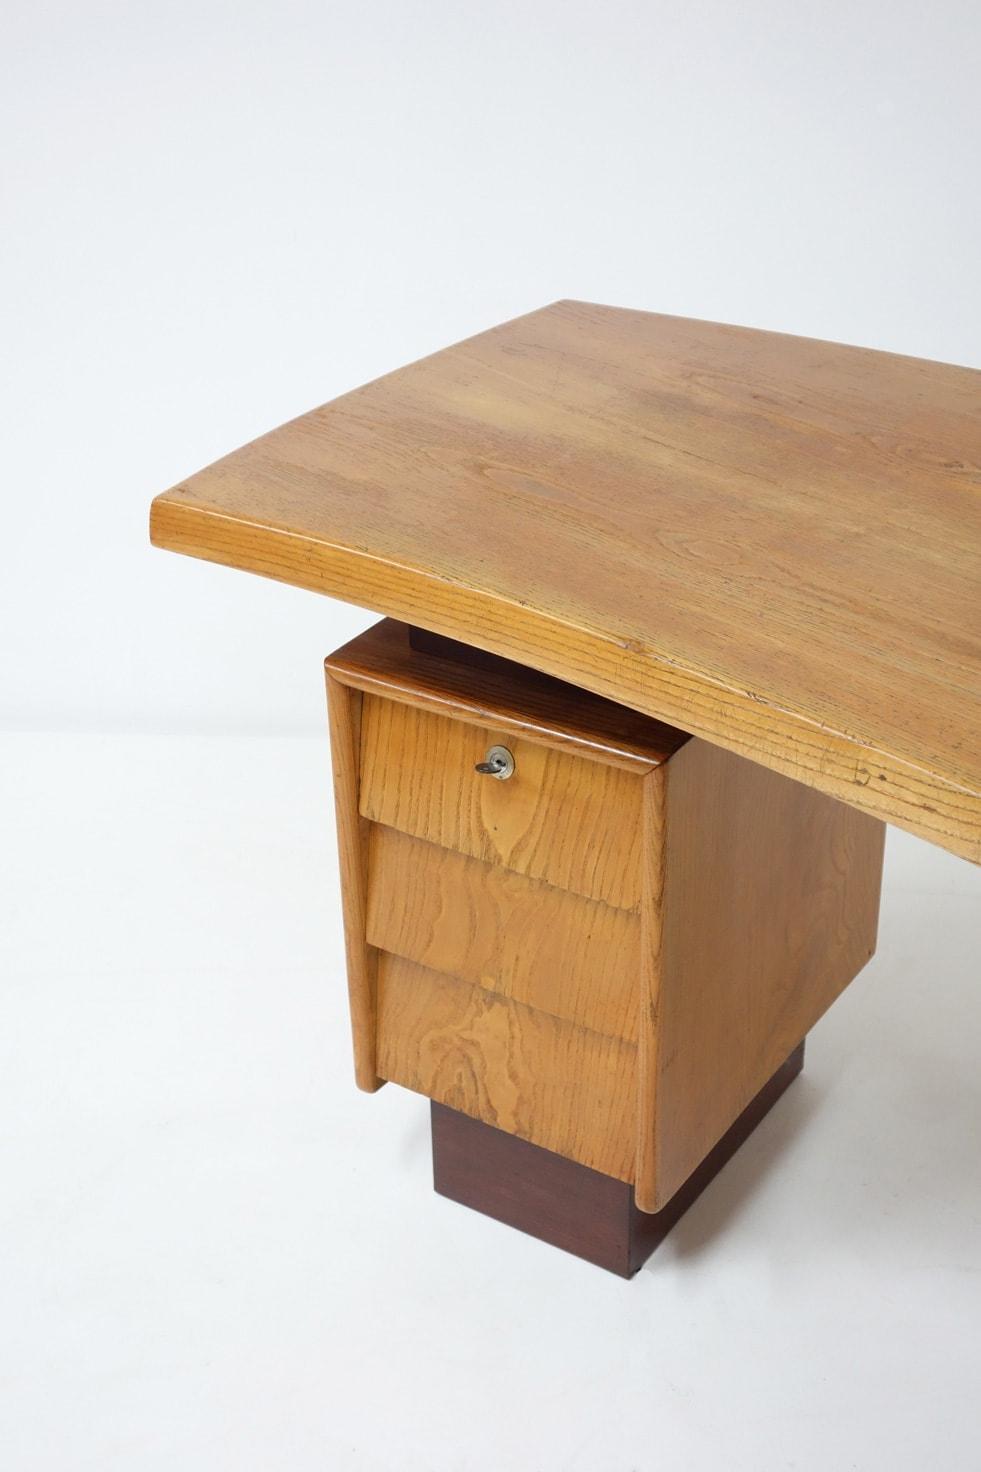 Charlotte Perriand & Pierre Jeanneret, Desk N°9, vue 02